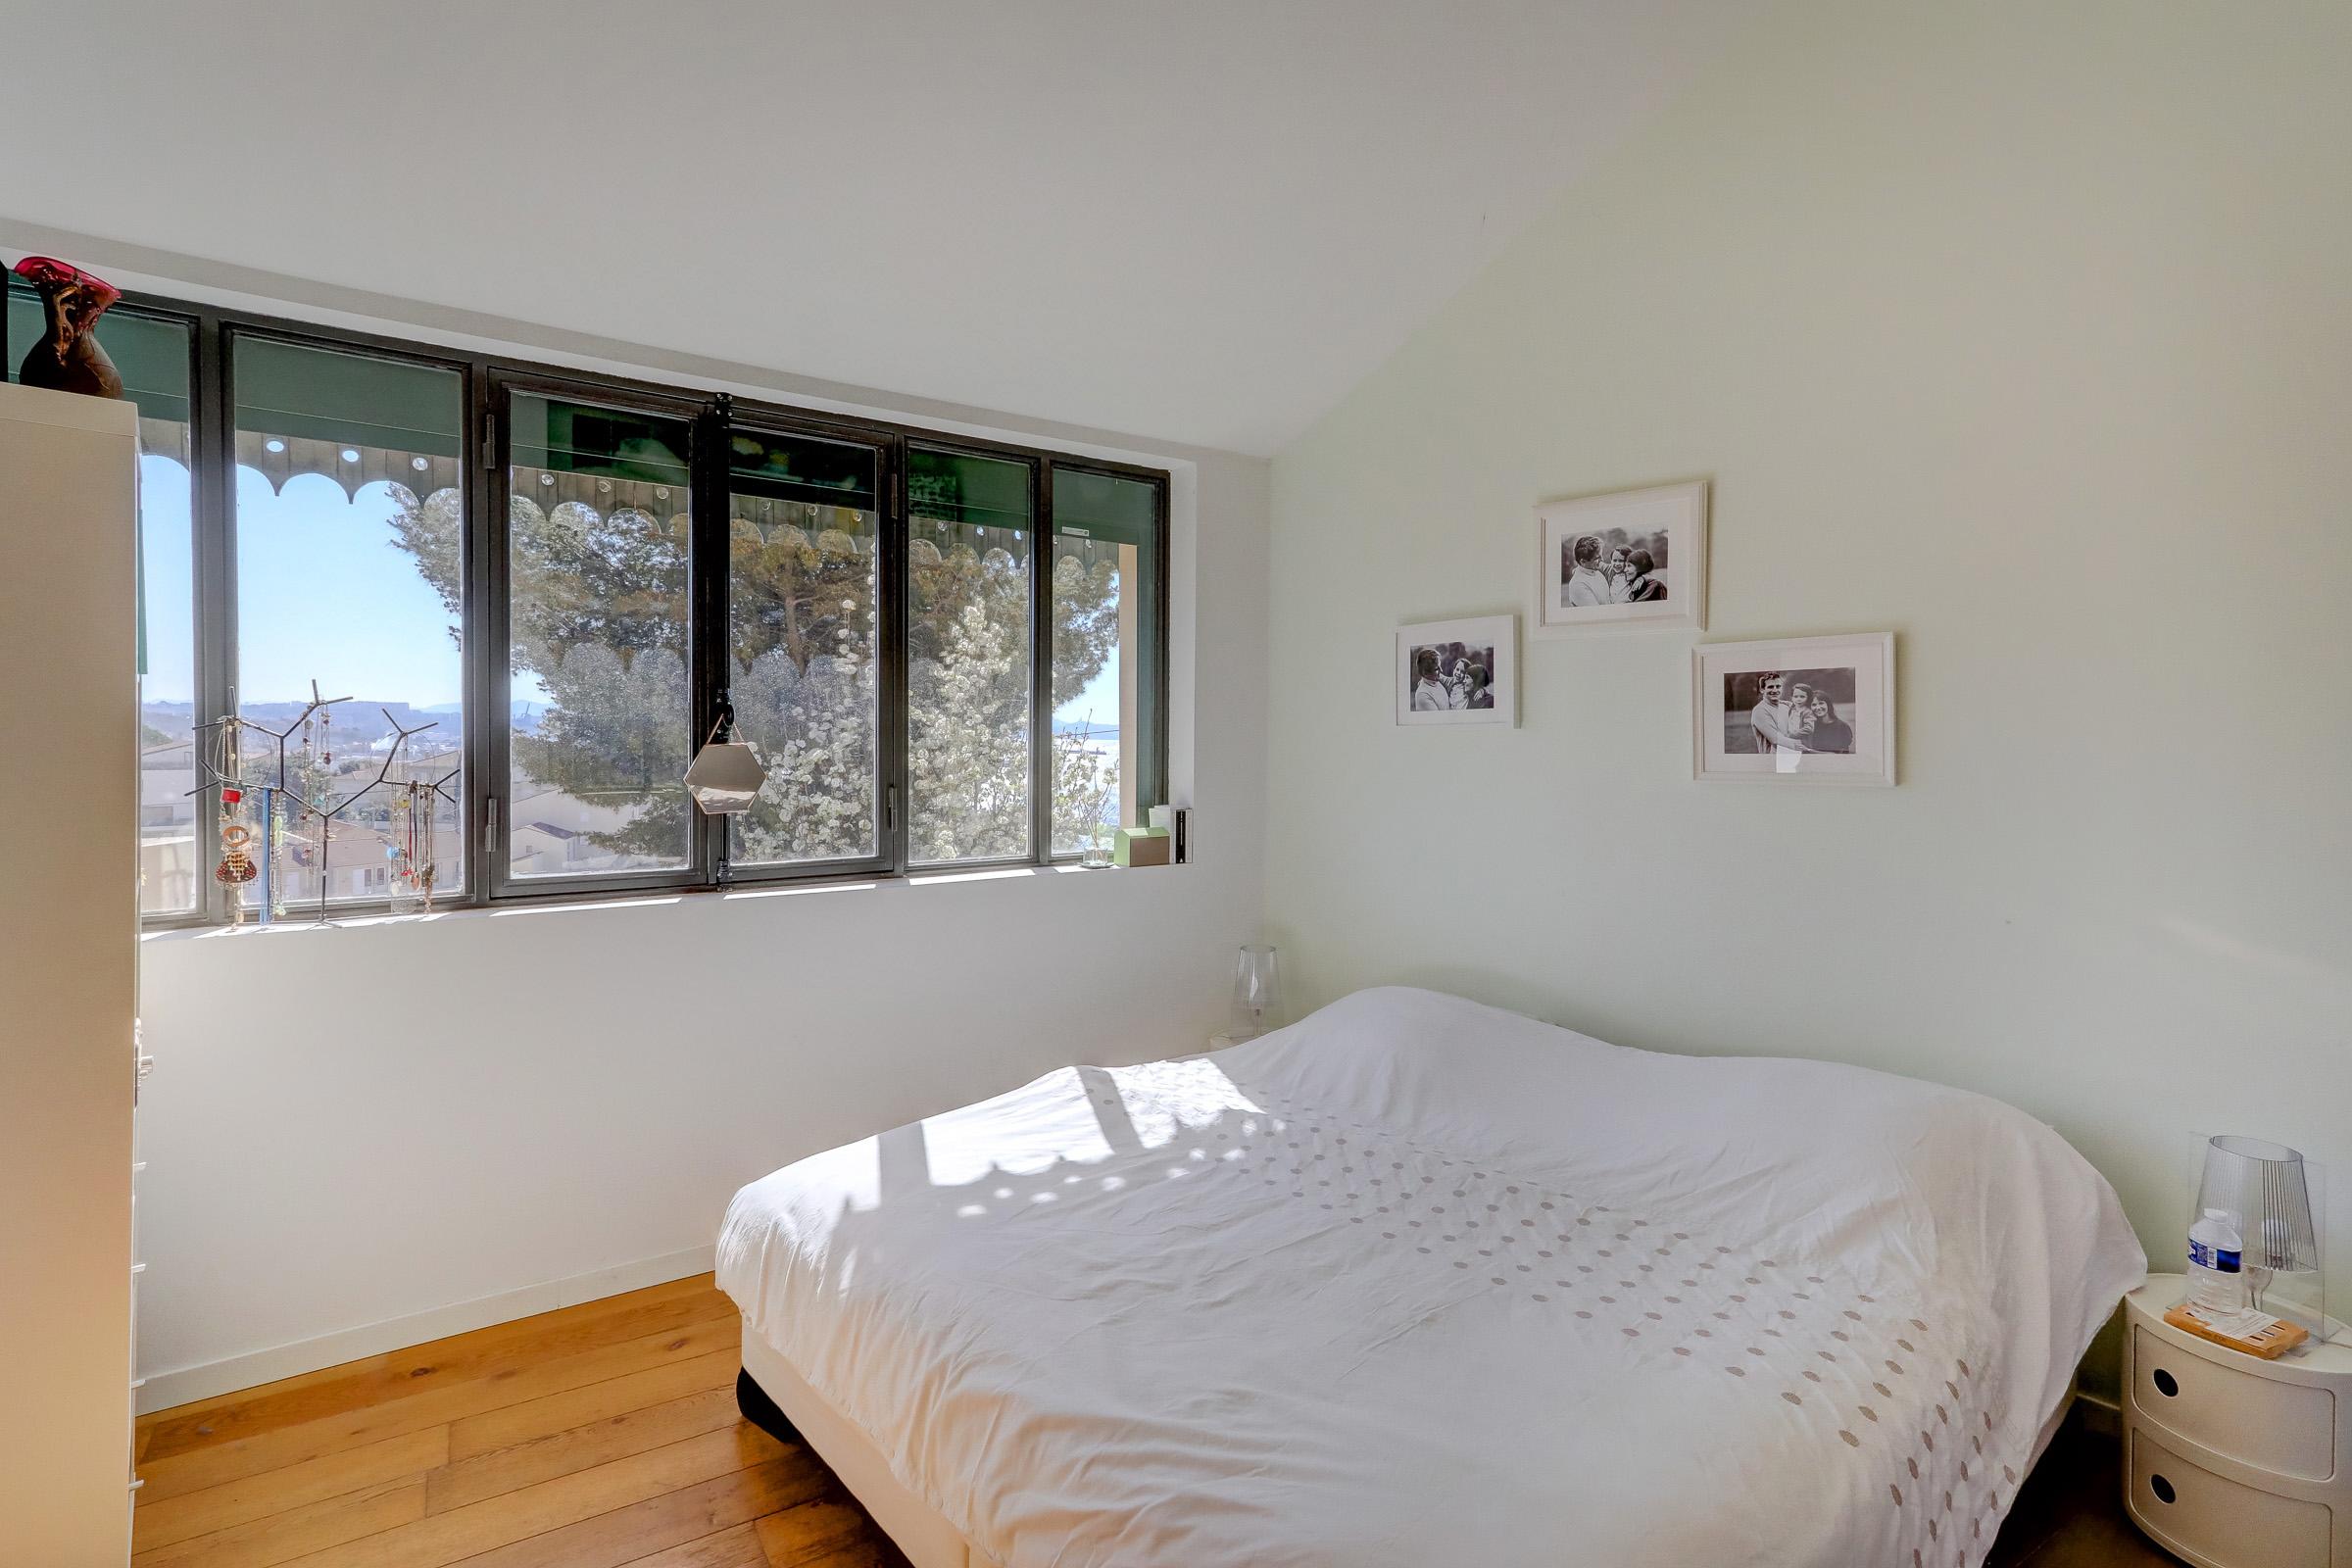 maison_jardin_estaque_marseille-27